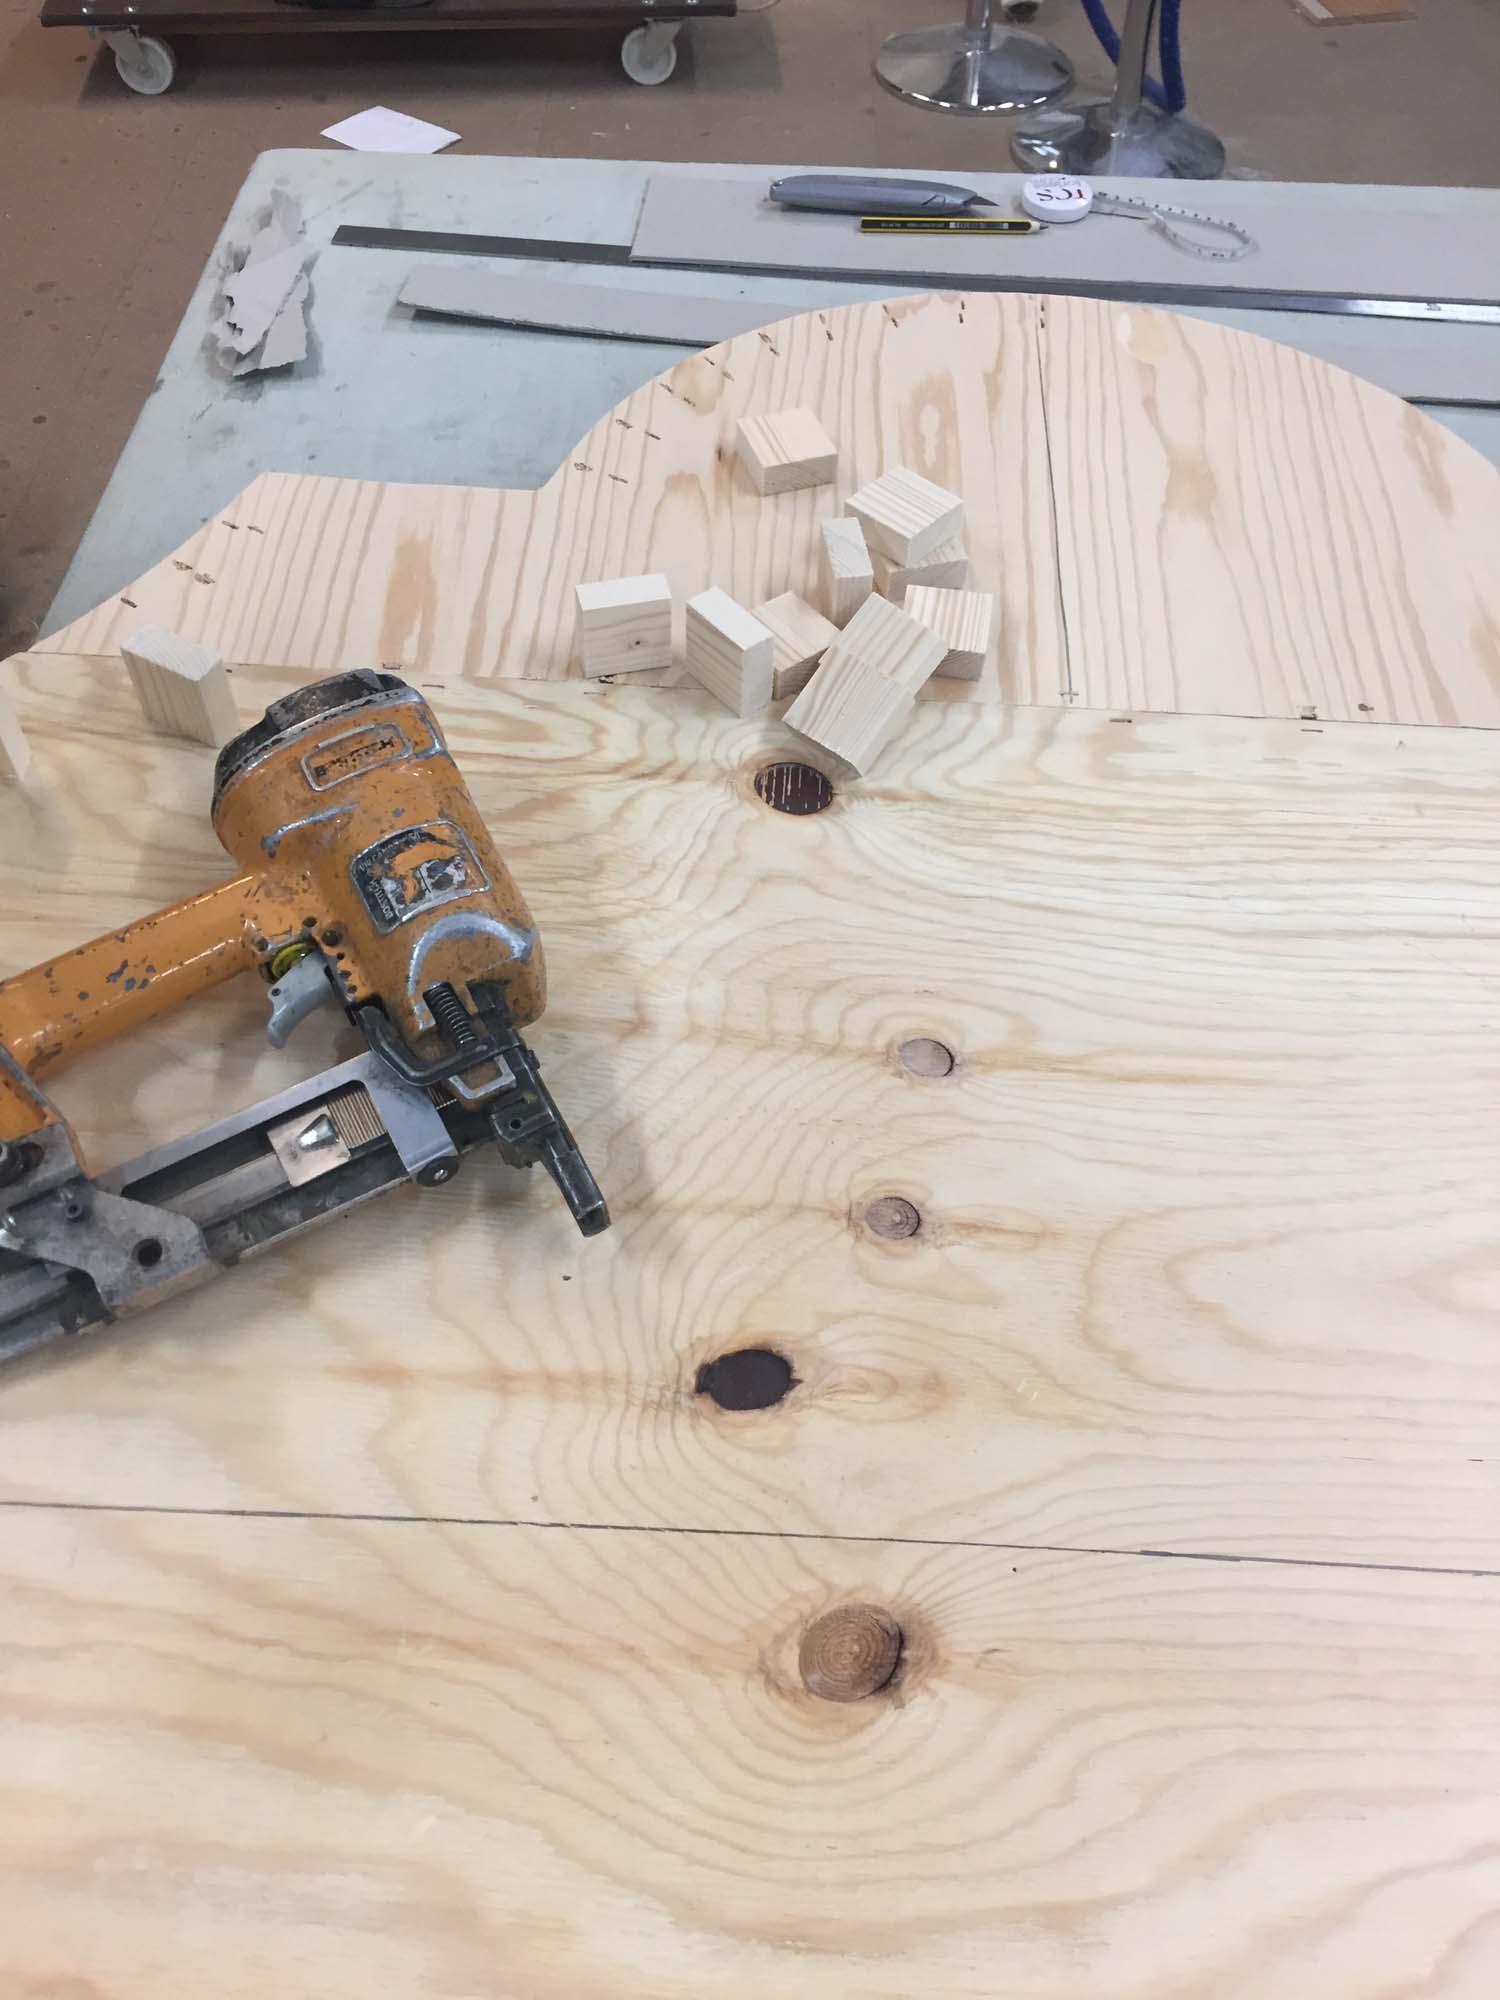 Shaping my headboard